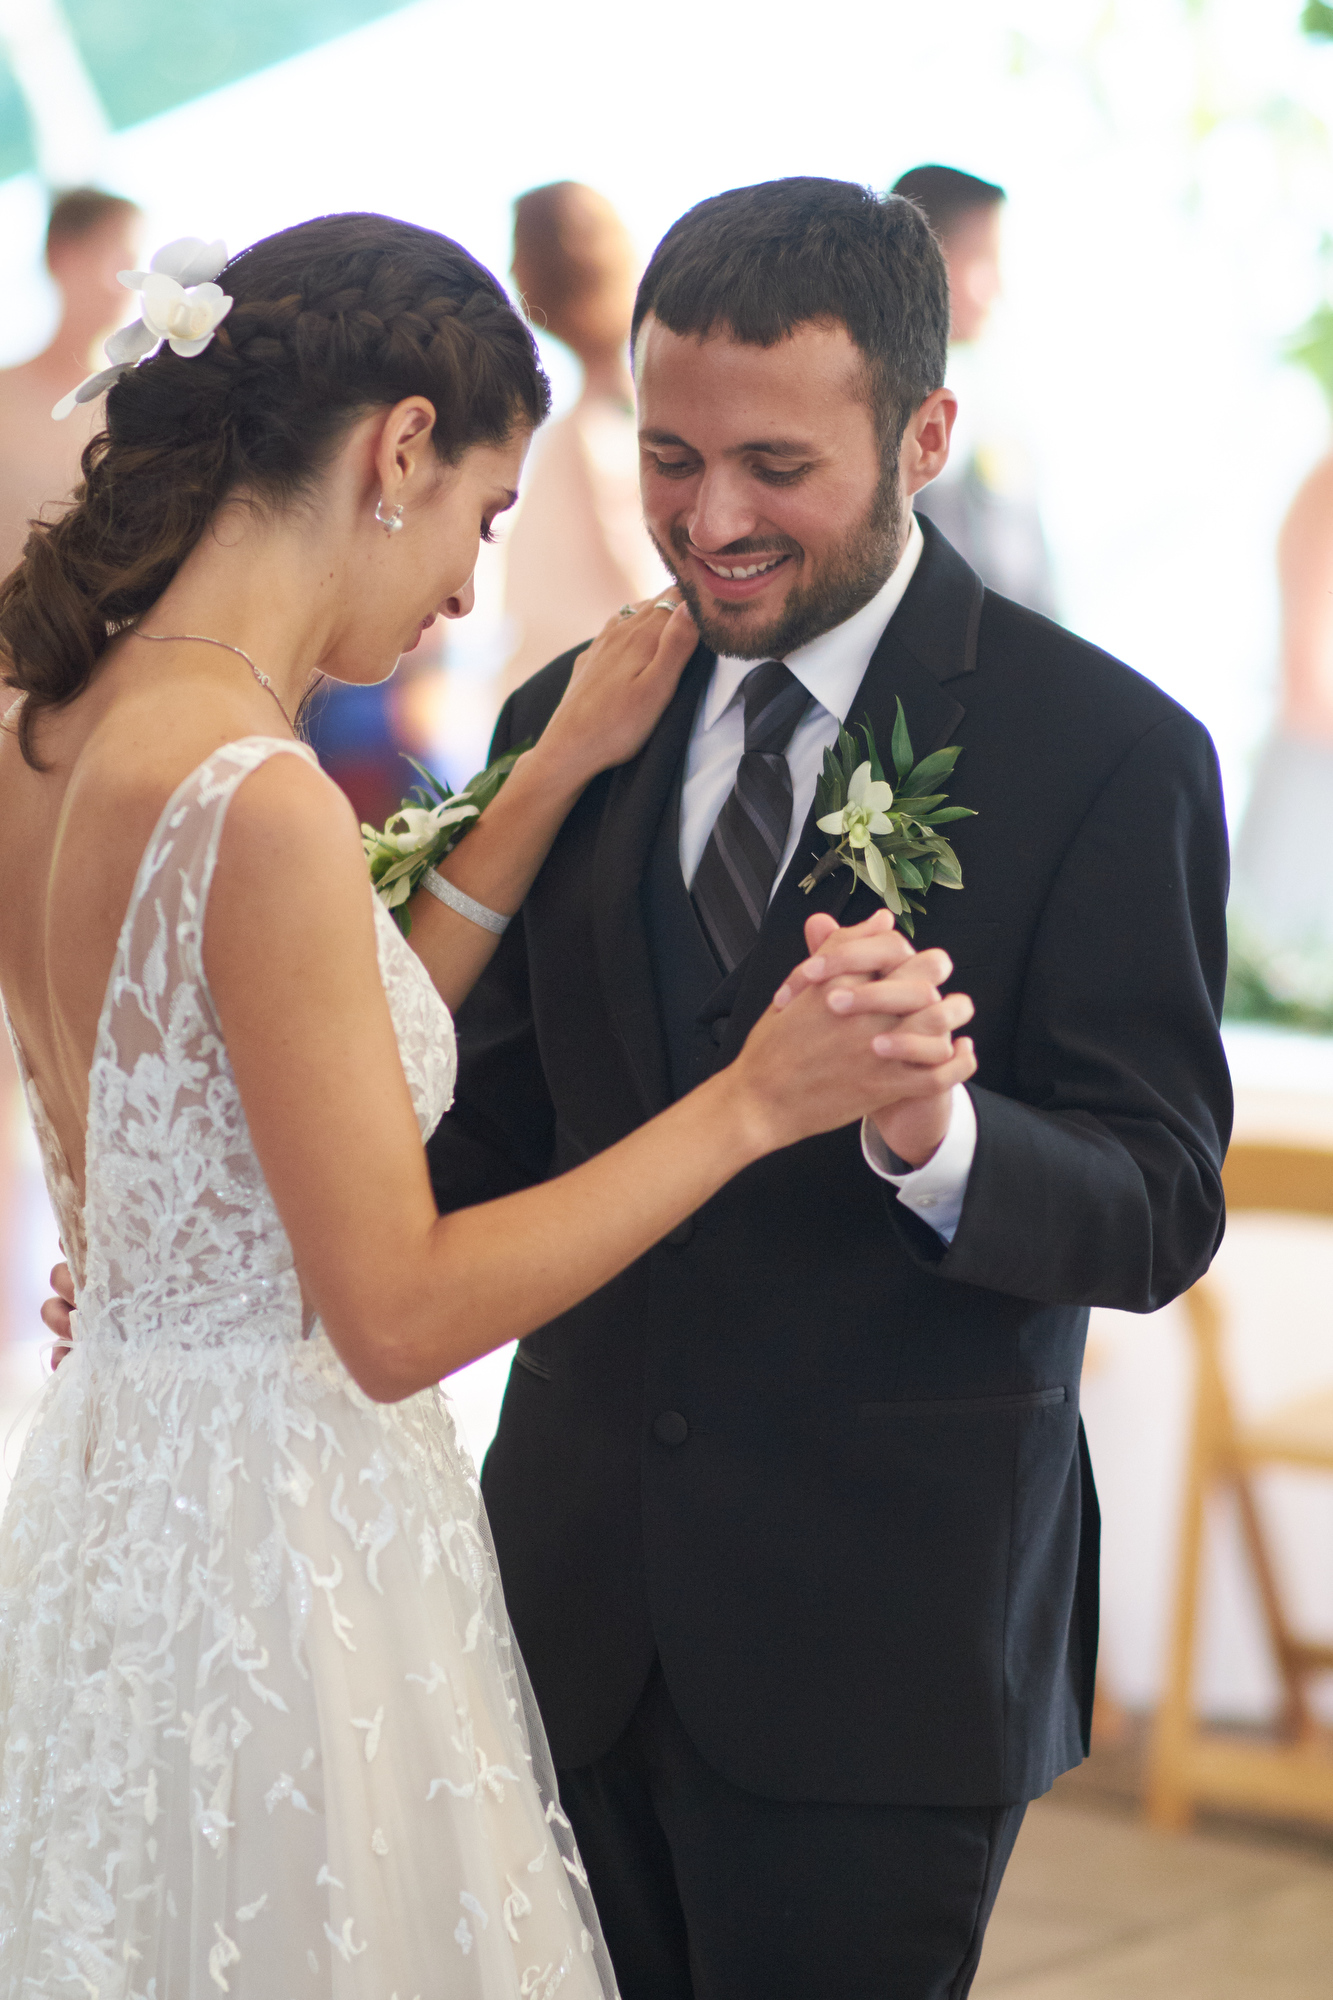 2019-07-20_17-57-00_FUJIFILM_X-T1_(c)_RH_weddingsbyryanandkate.com.JPG